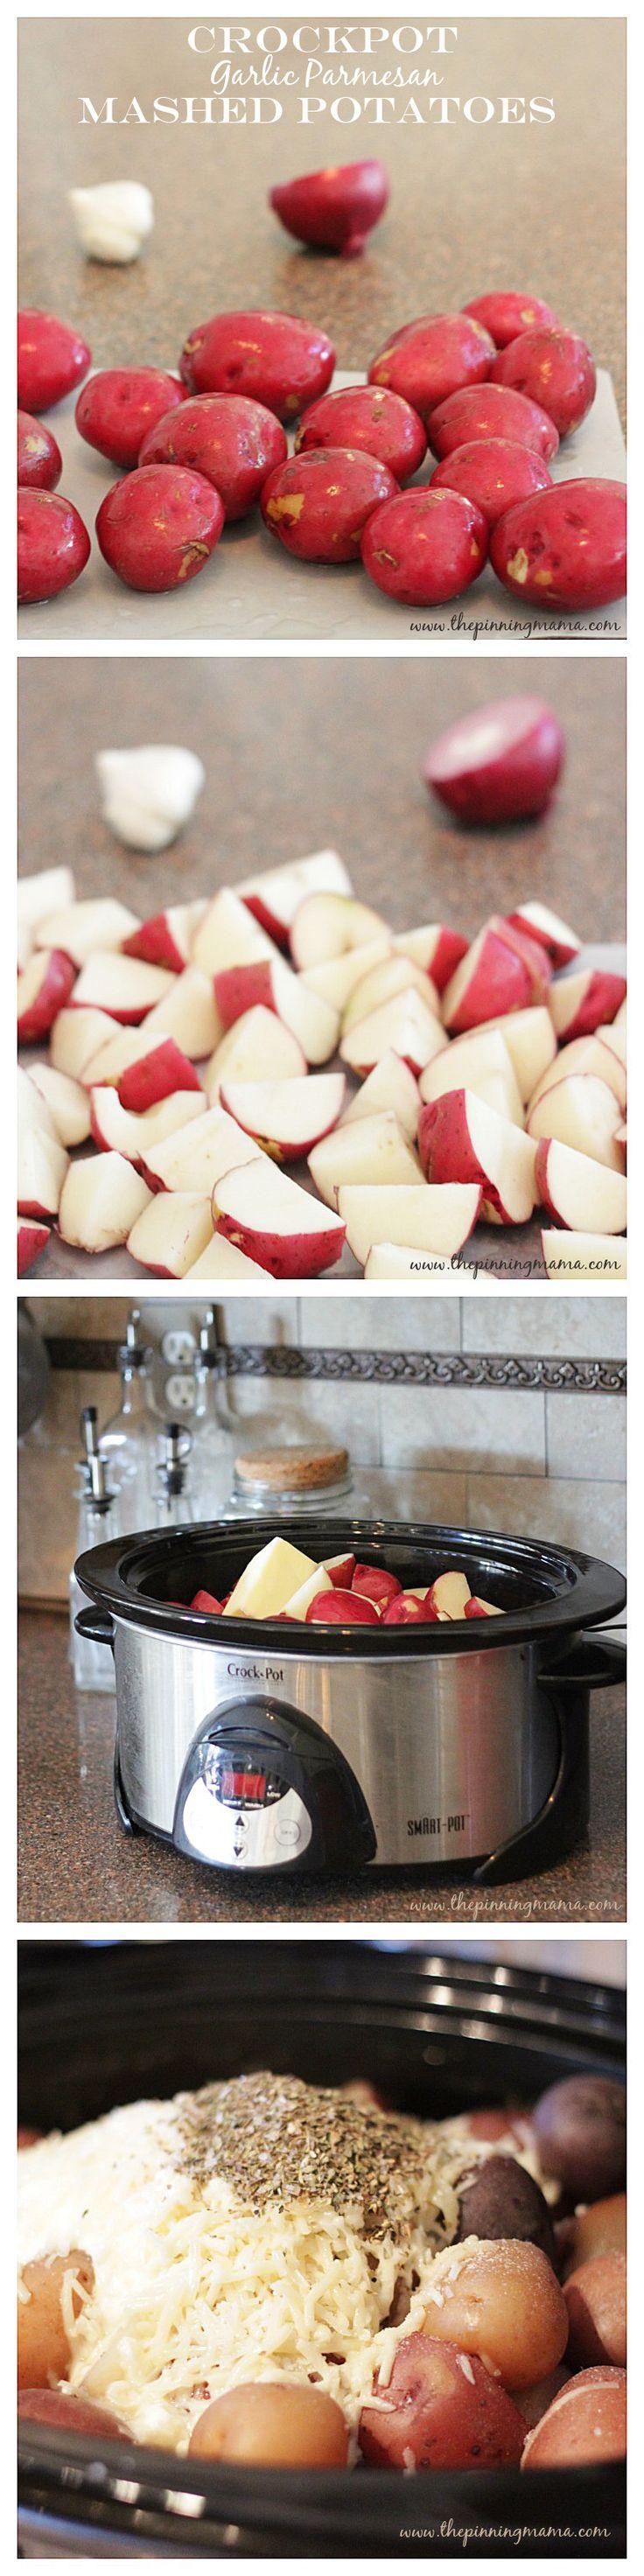 Crock Pot Garlic Parmesan Mashed Potatoes- an easy side!